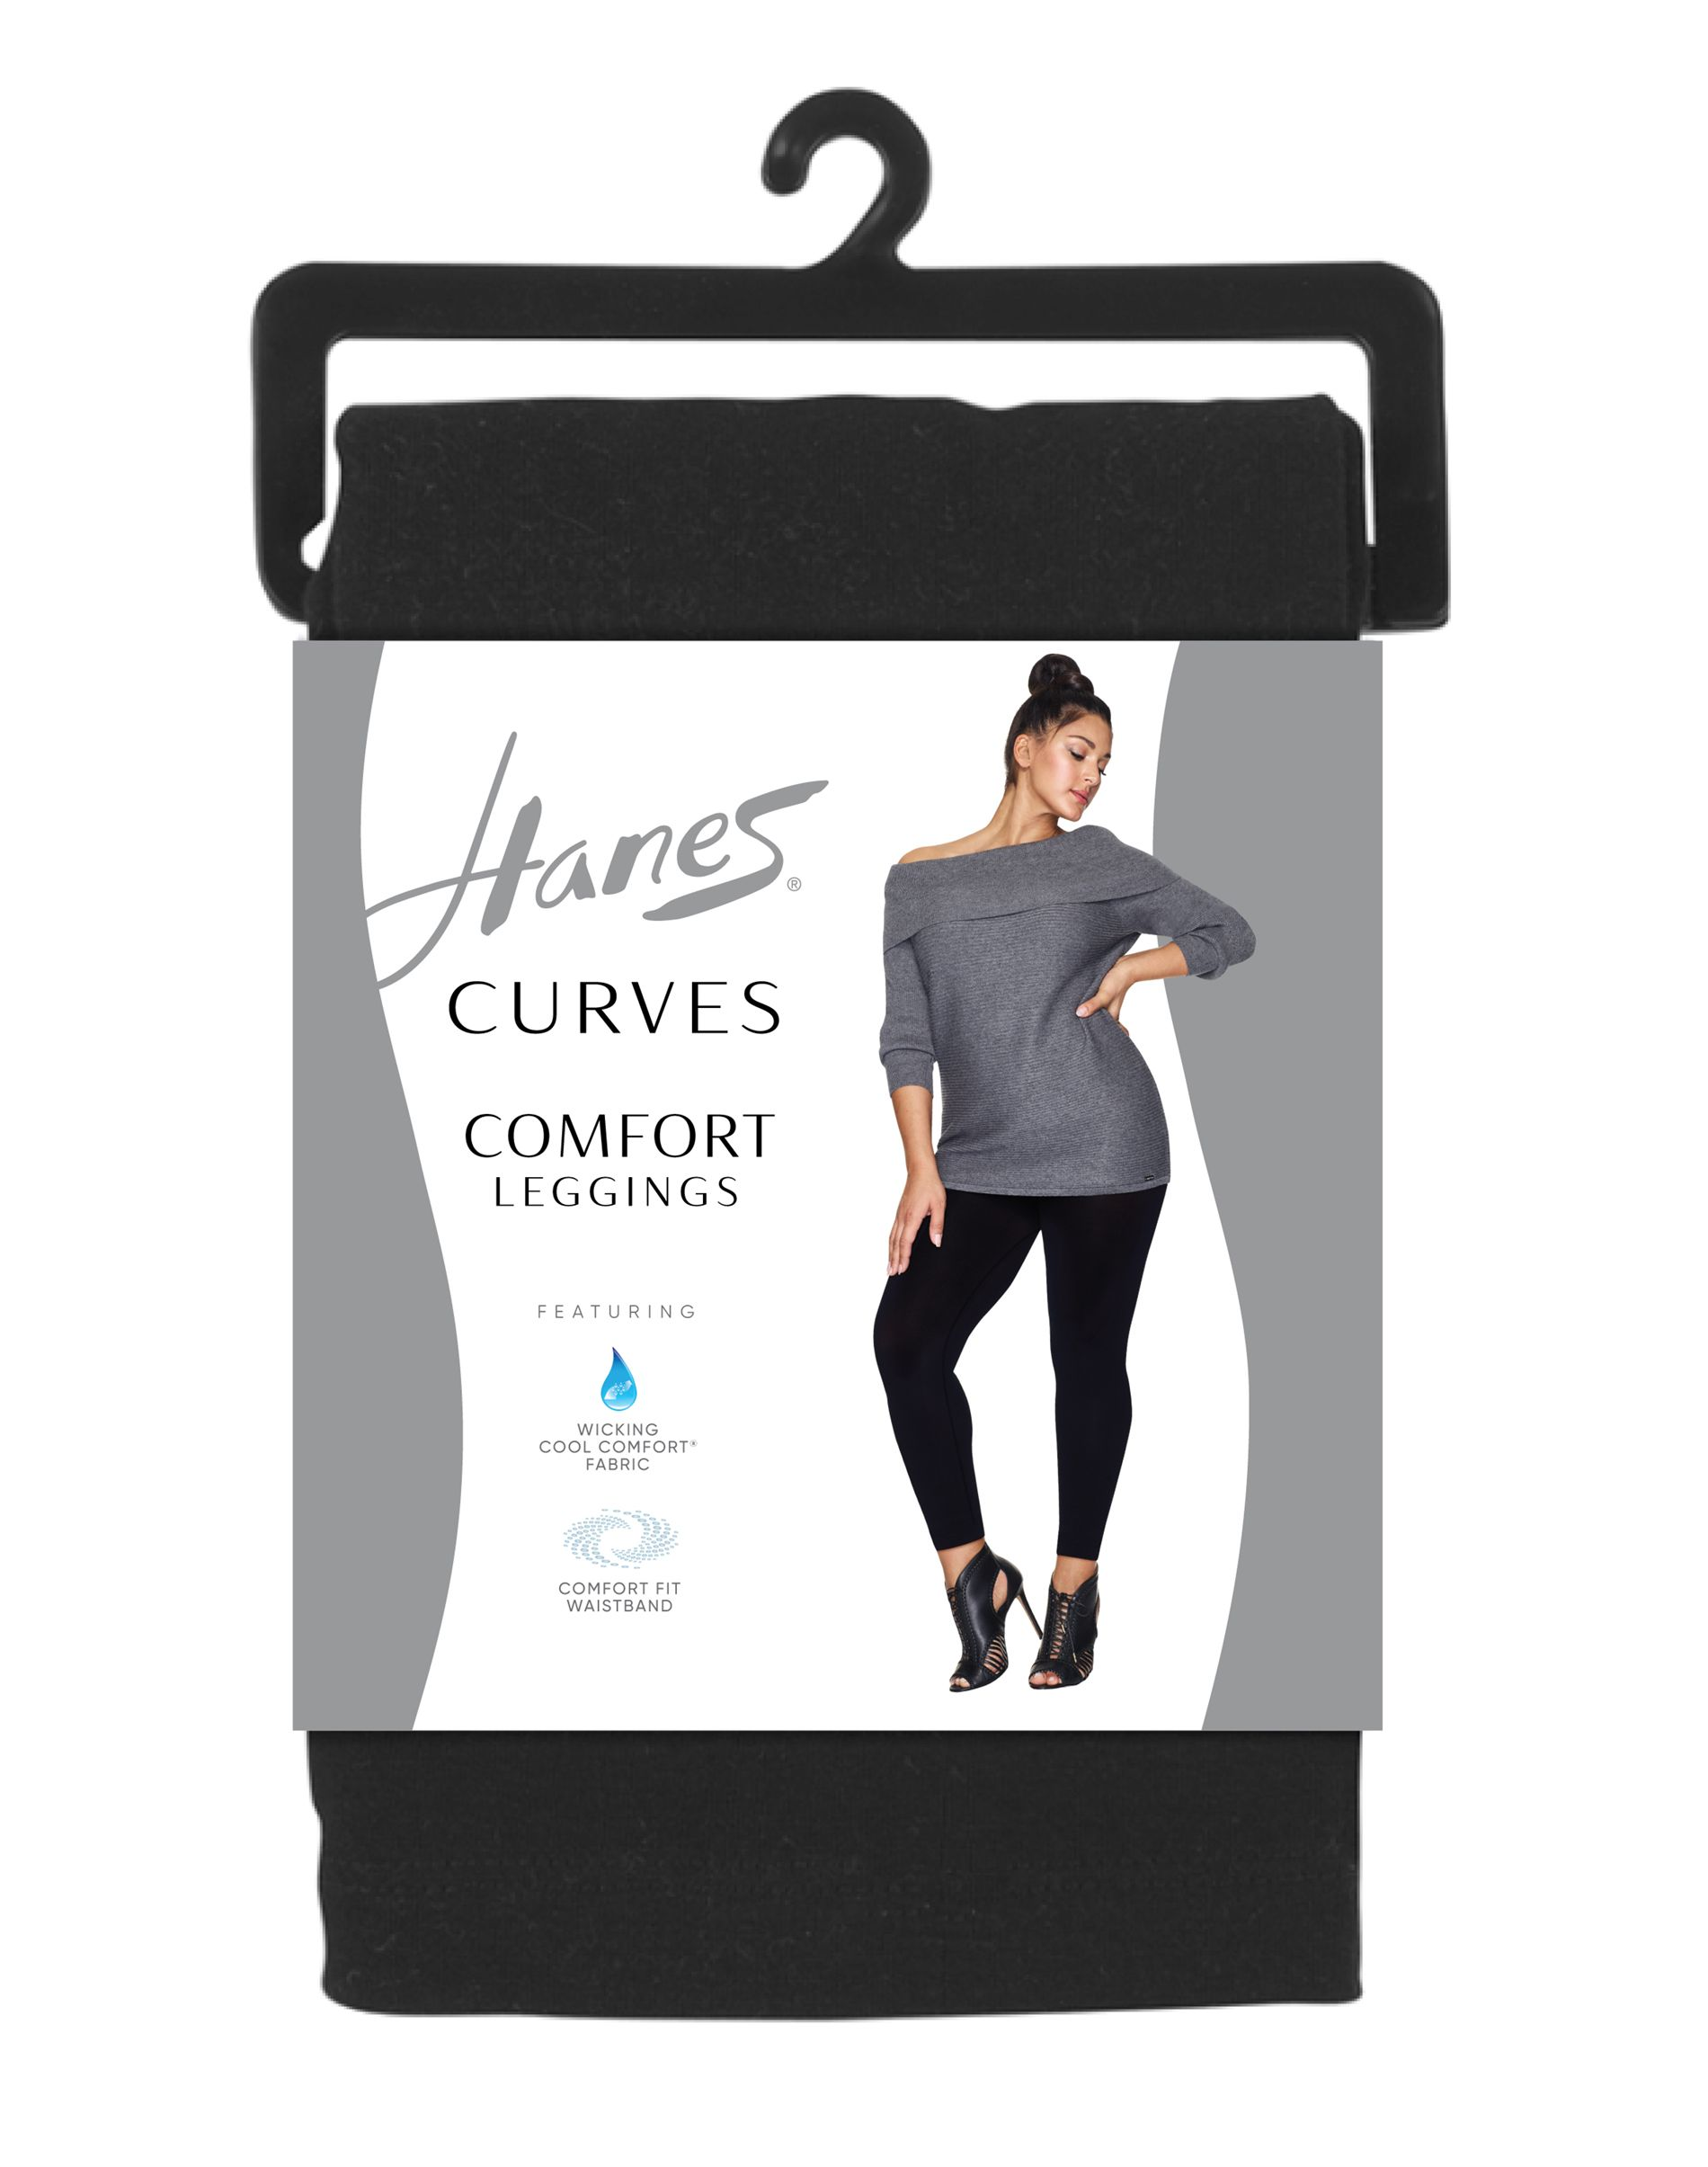 hanes curves comfort leggings women Hanes